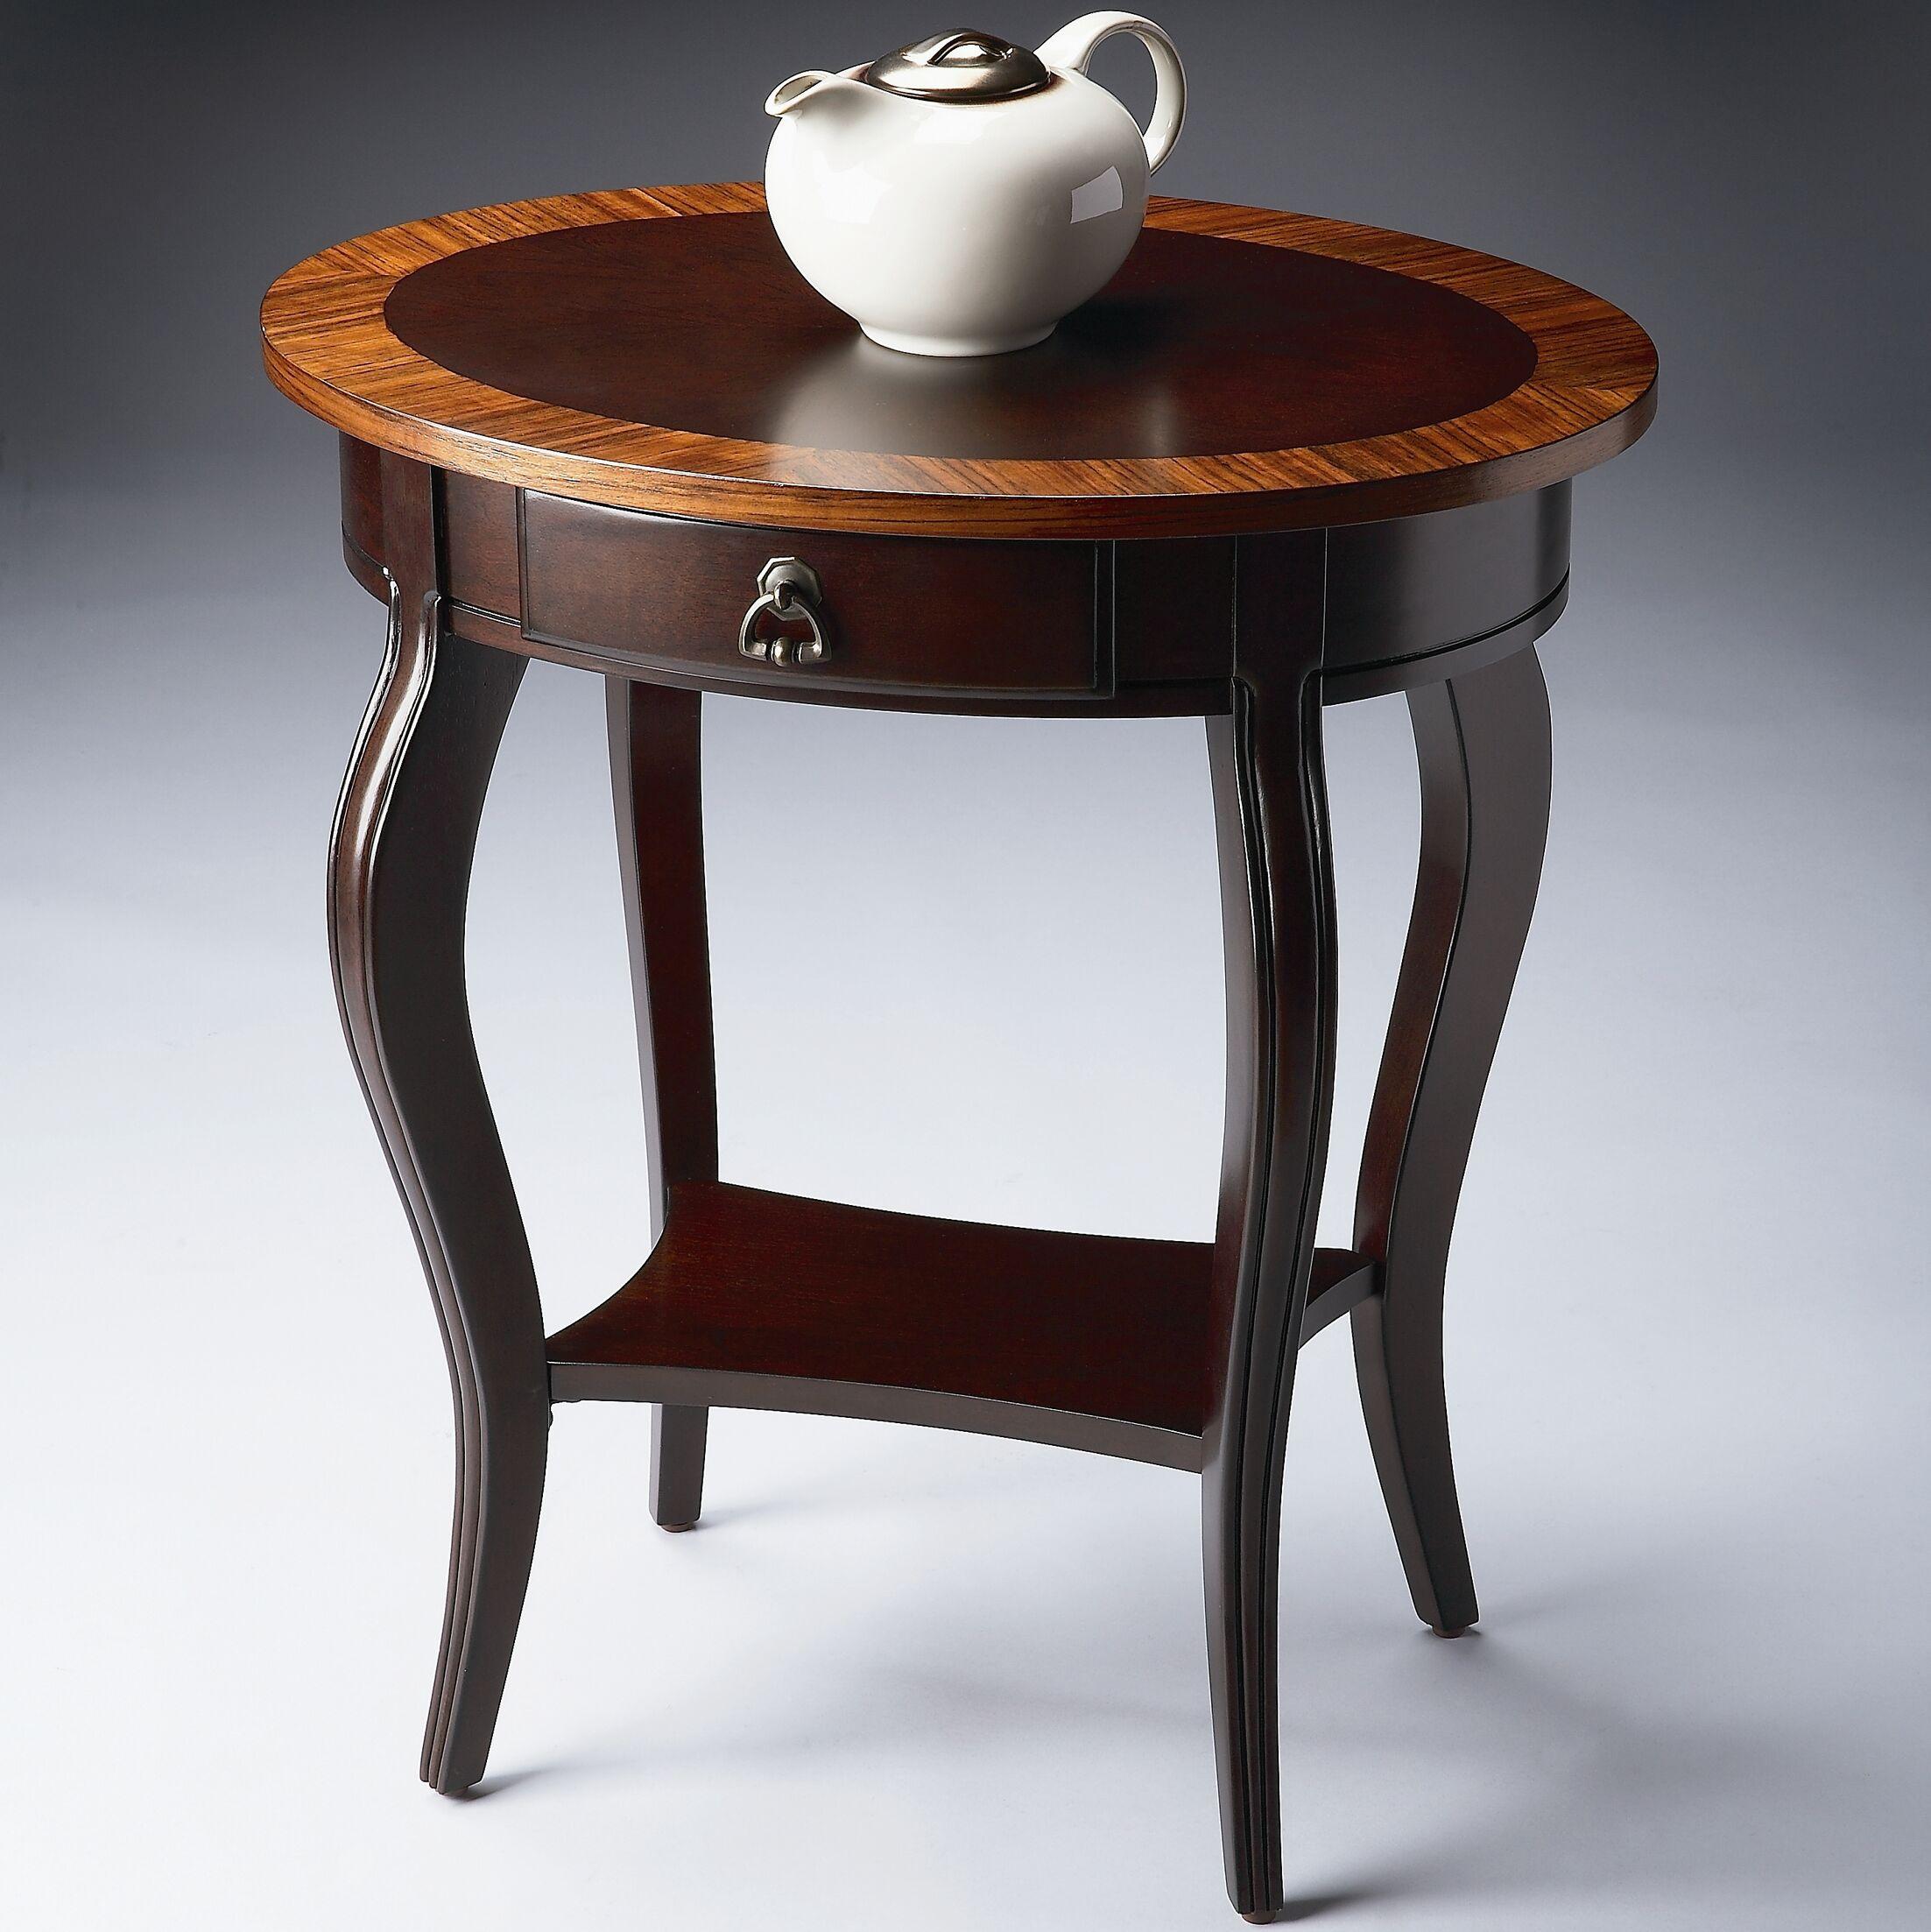 Gulielma 1 Drawer Oval End Table